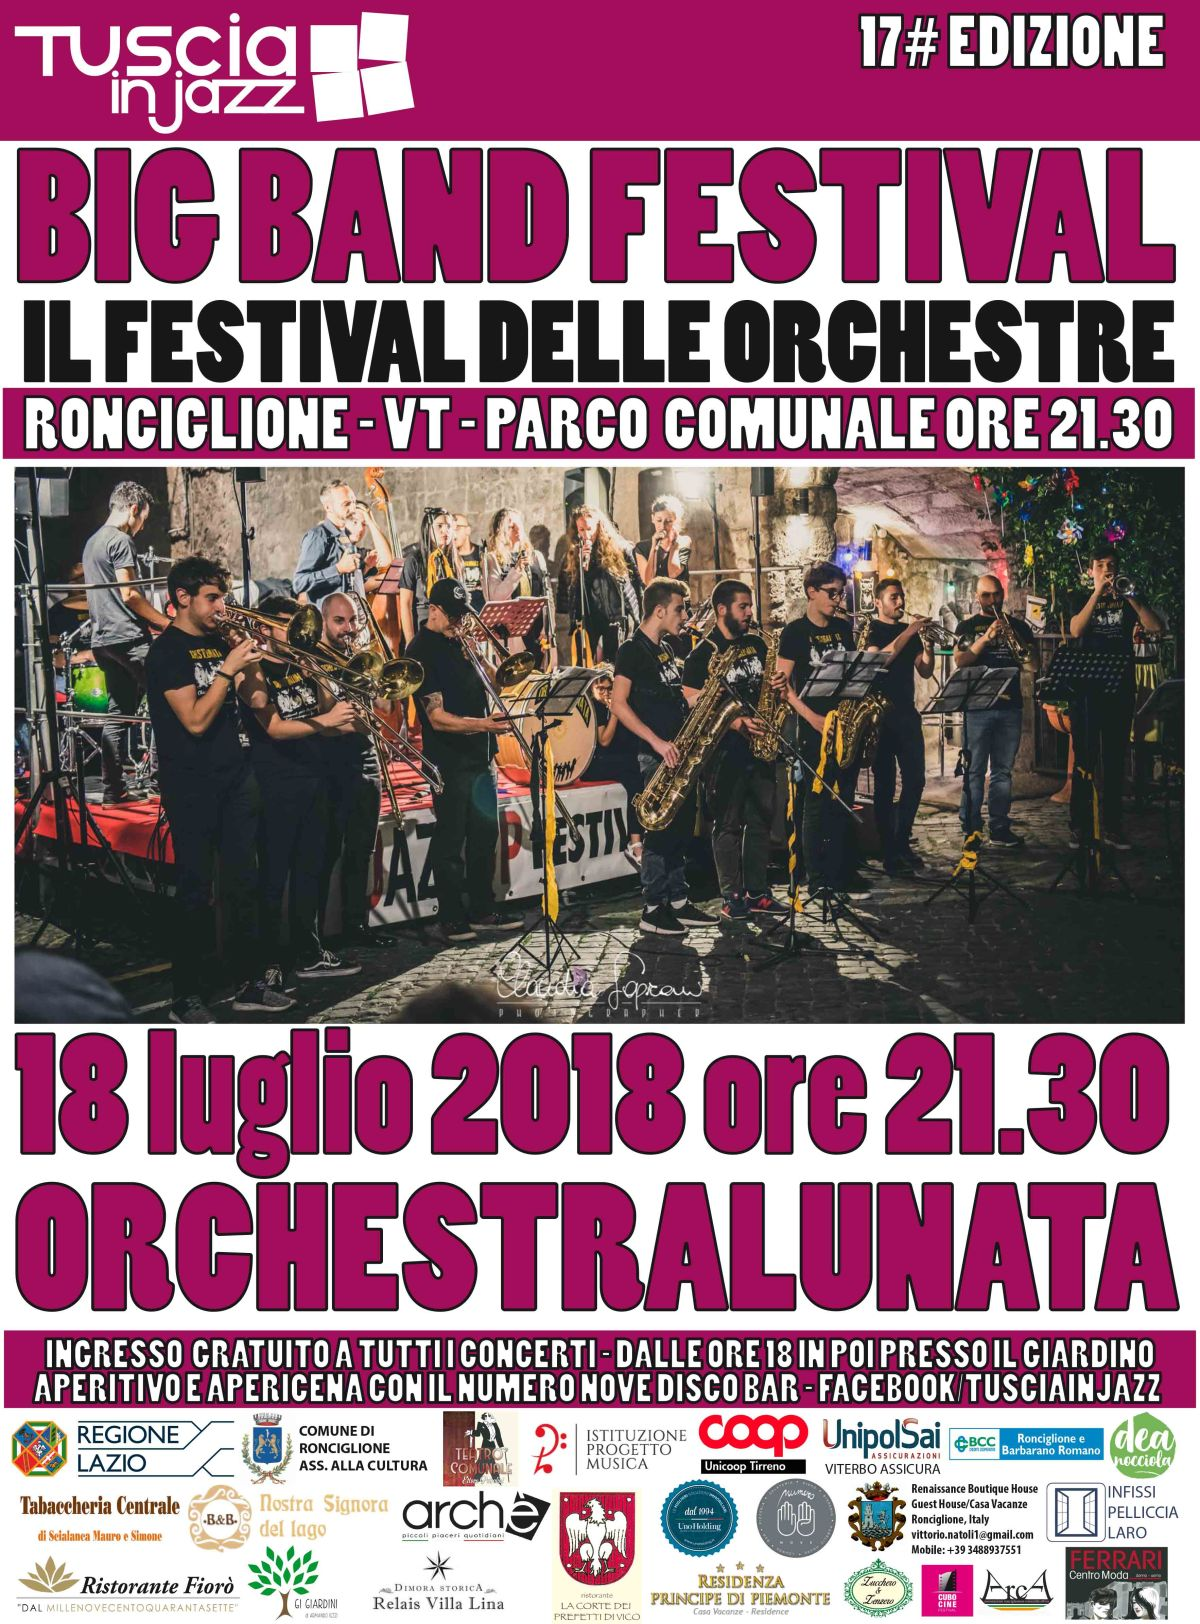 ORCHESTRALUNATA BIG BAND FESTIVAL 2018.jpg